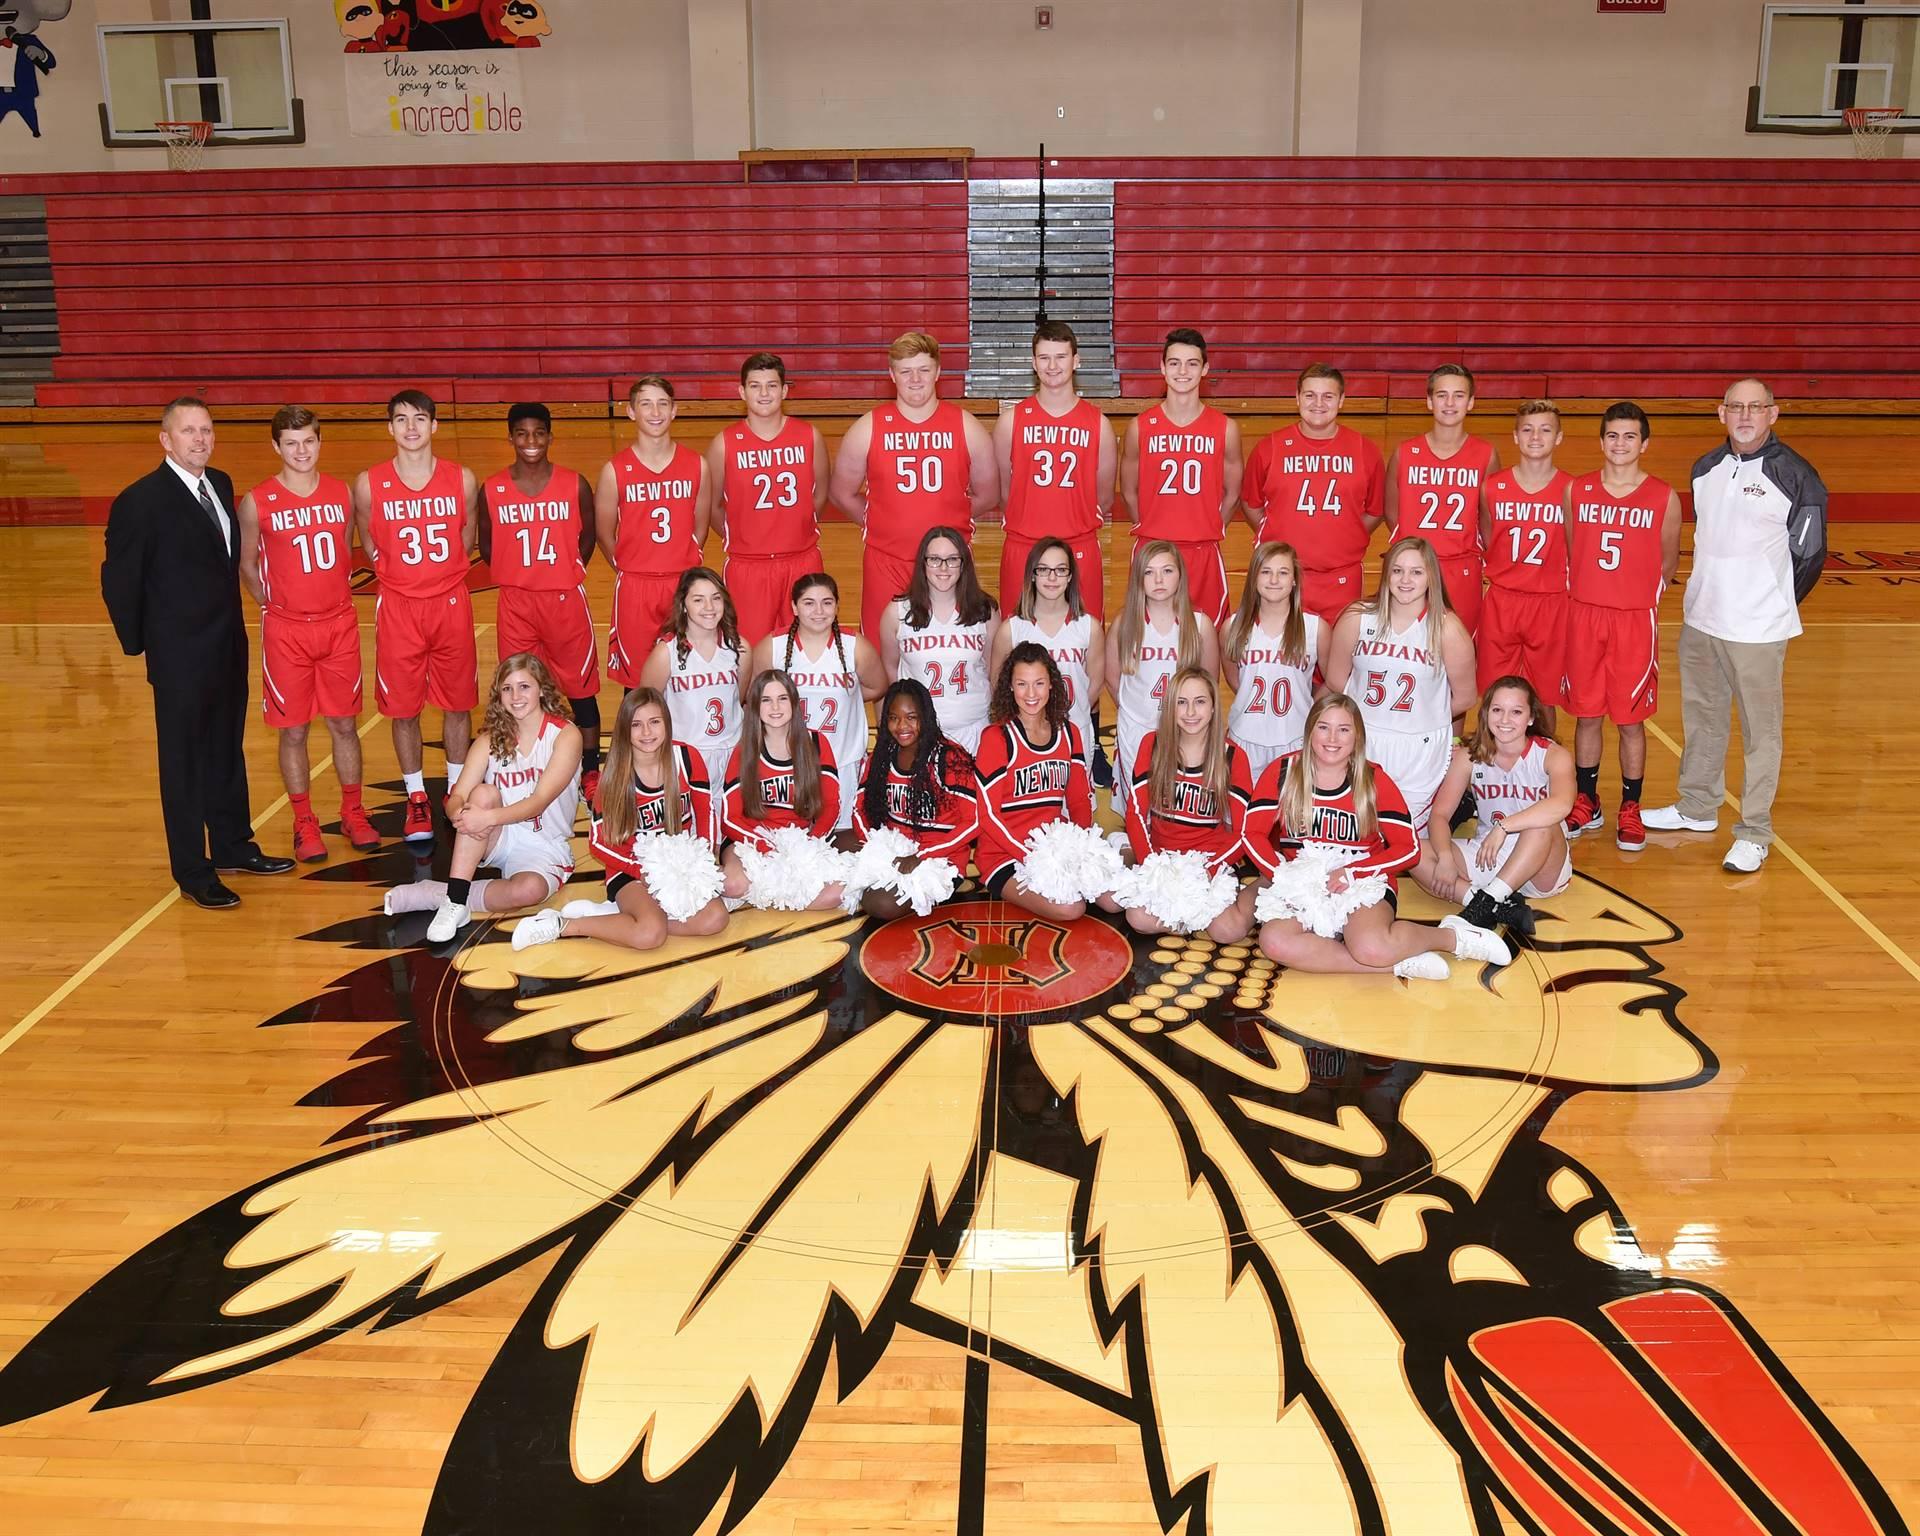 Newton JV Basket Ball Teams and Cheerleaders